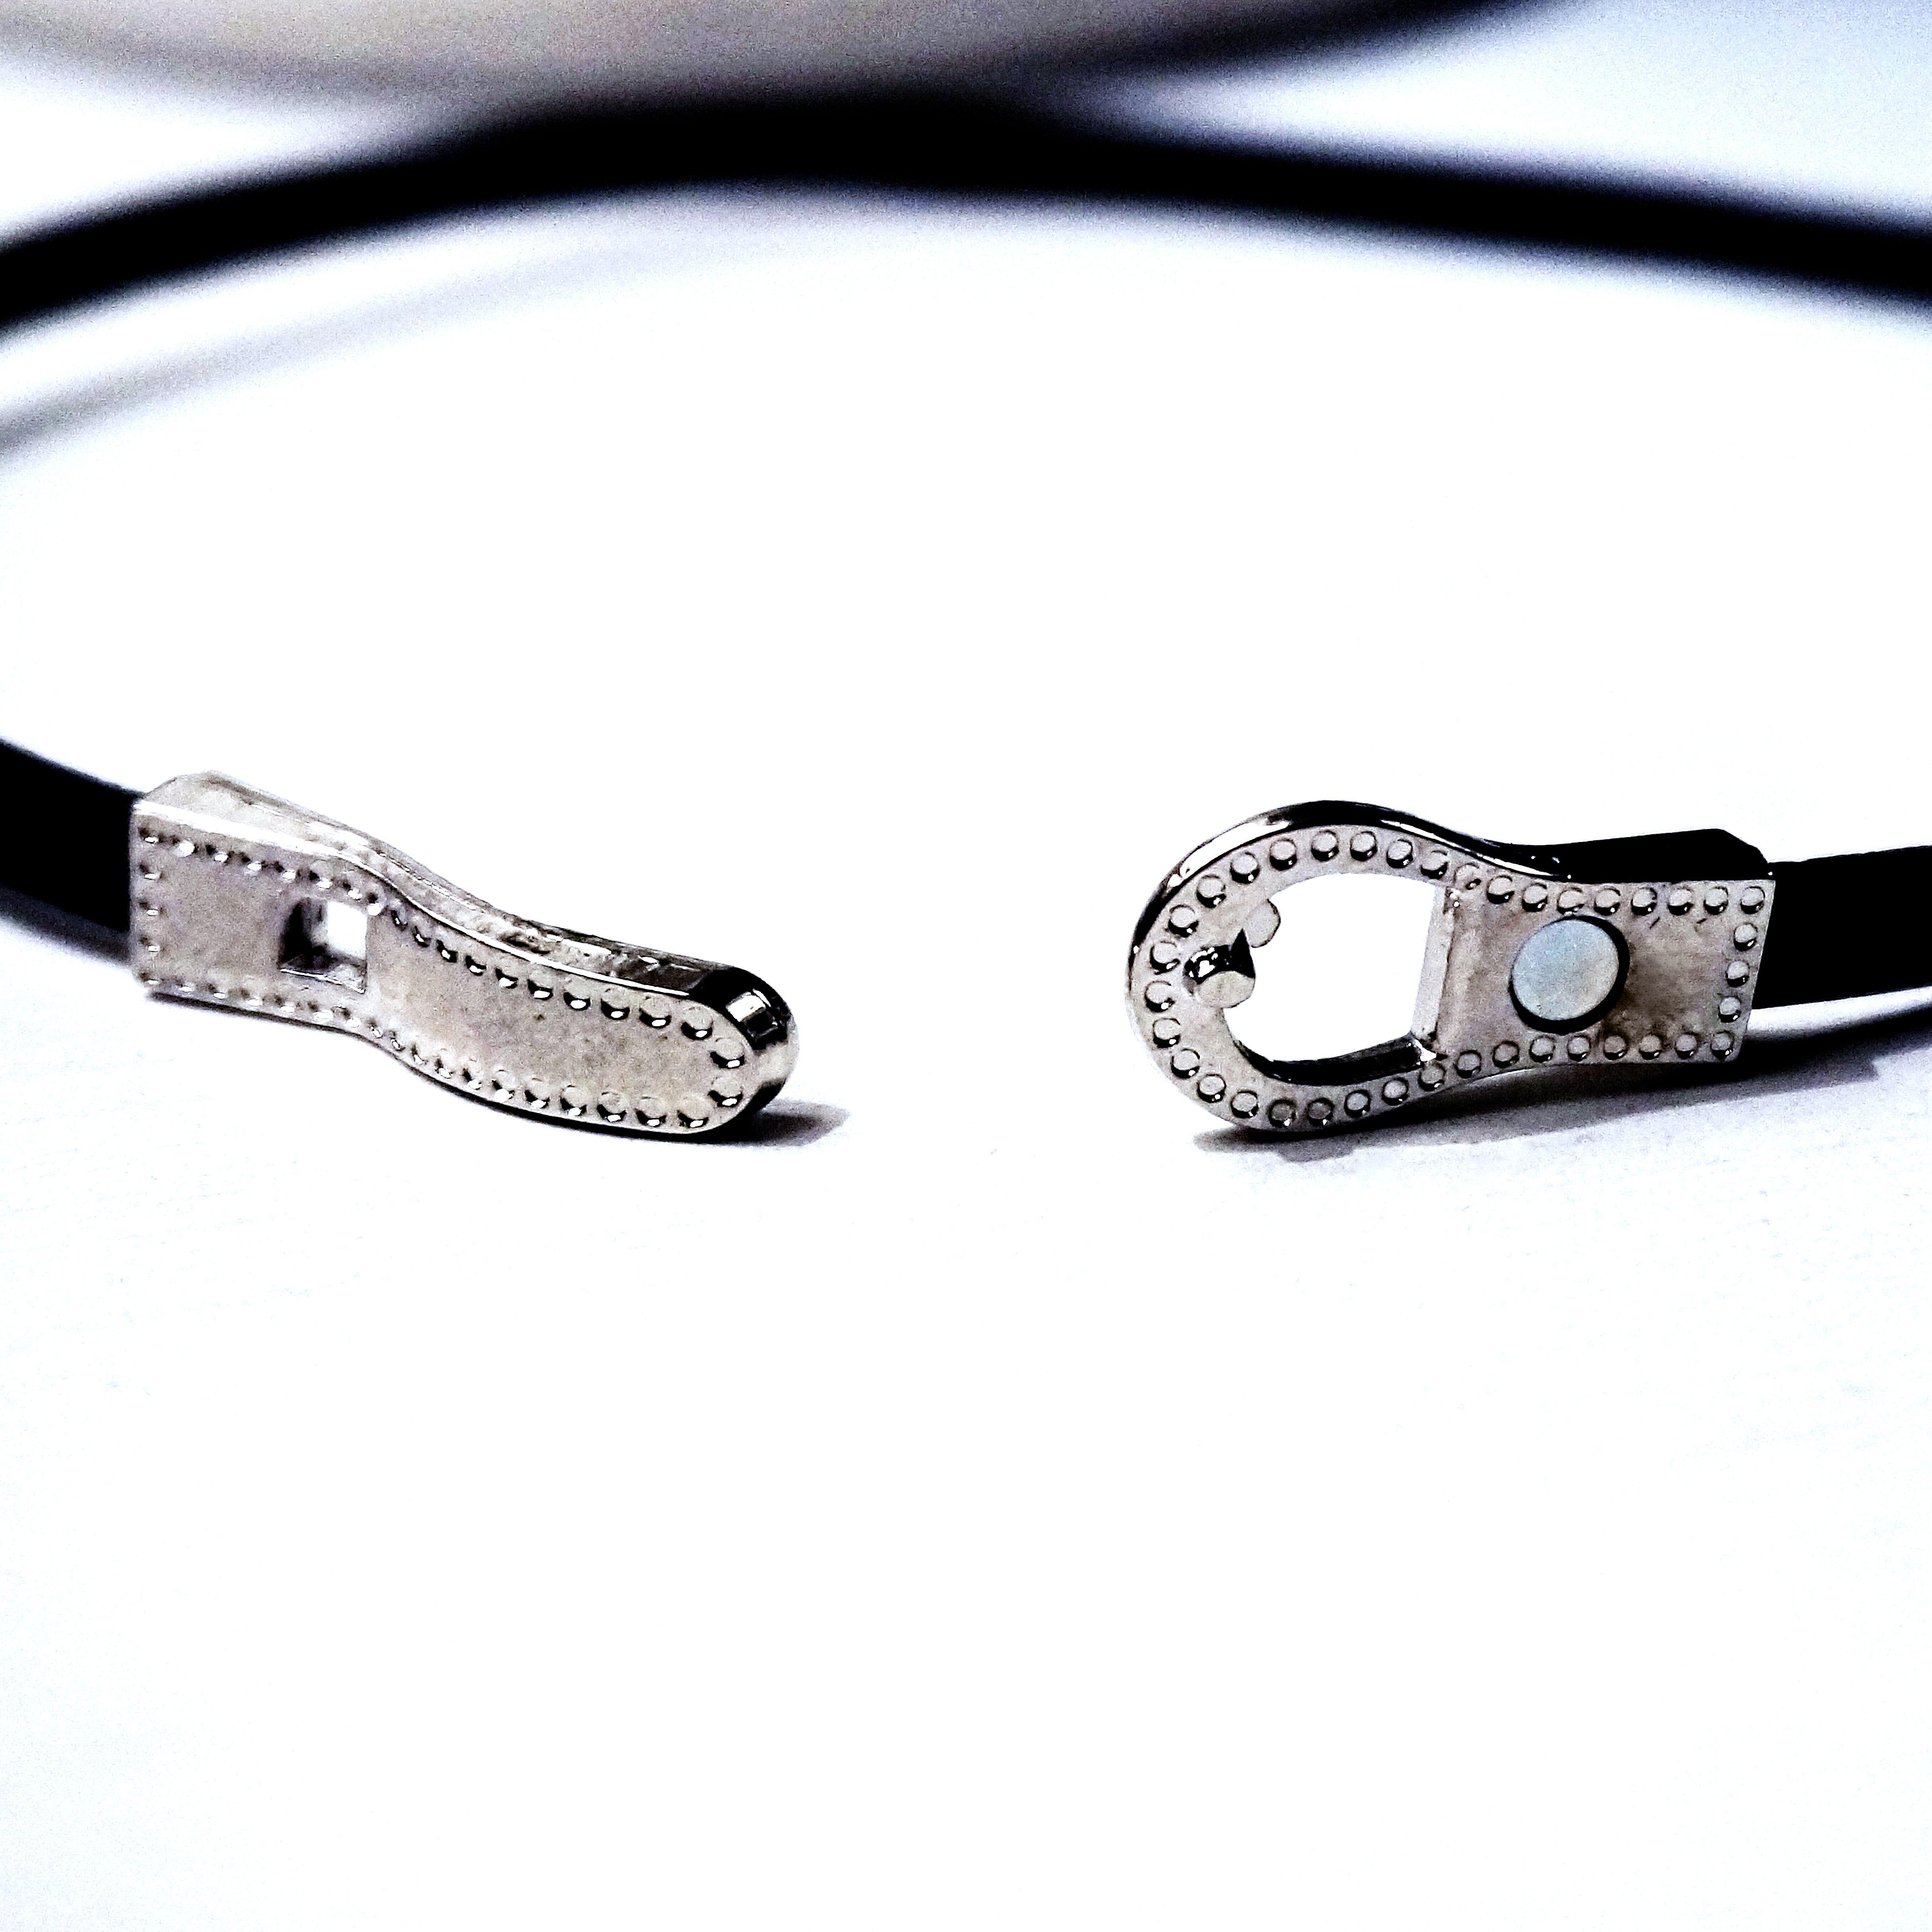 Submissive triskele collar necklace bdsm symbol triskelion lock product details biocorpaavc Gallery